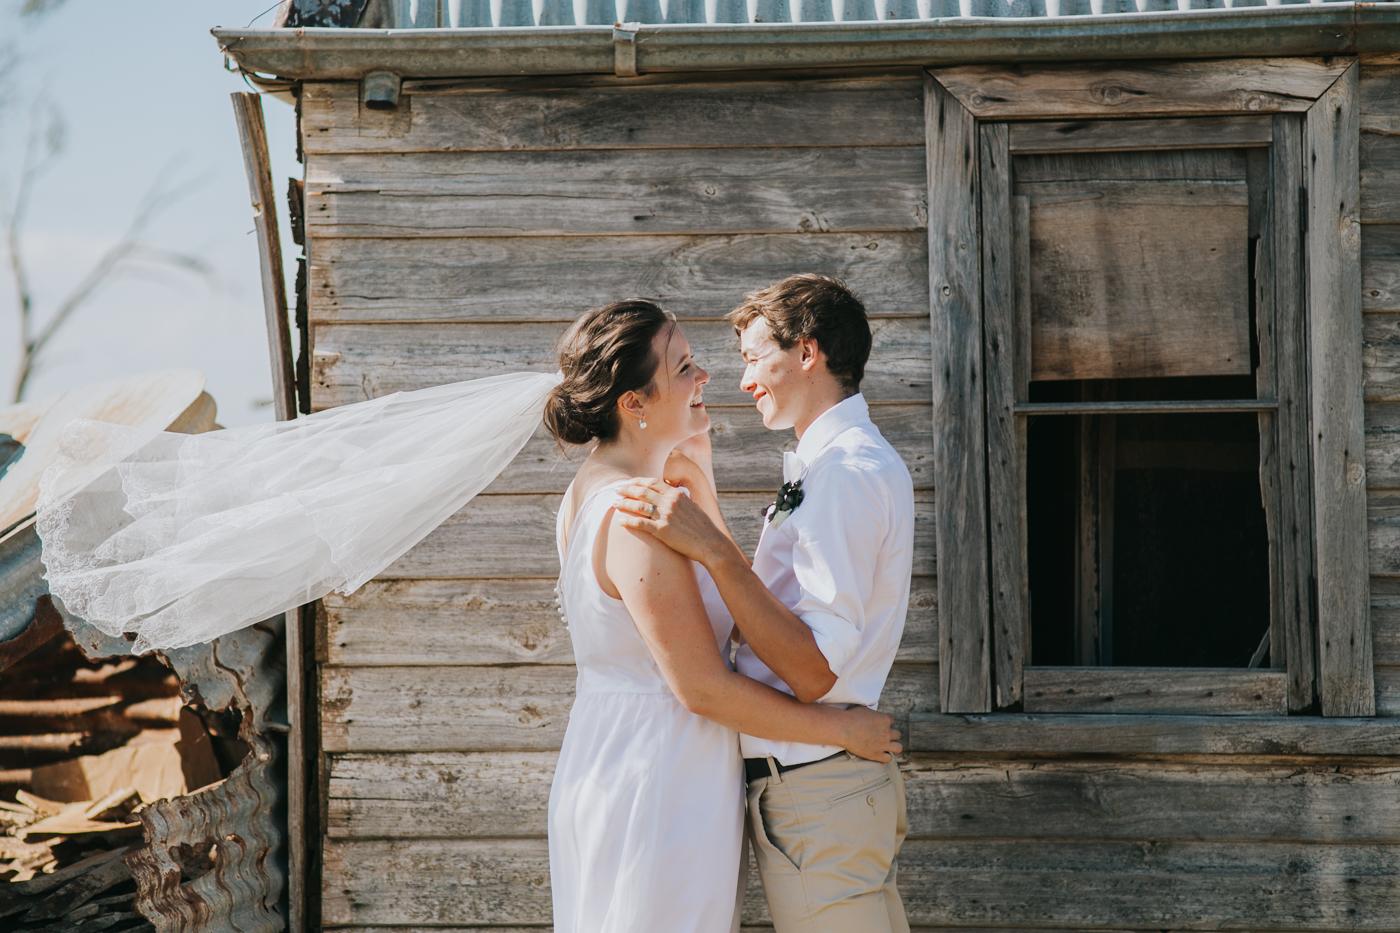 Nicolle & Jacob - Dubbo Wedding - Country Australia - Samantha Heather Photography-152.jpg